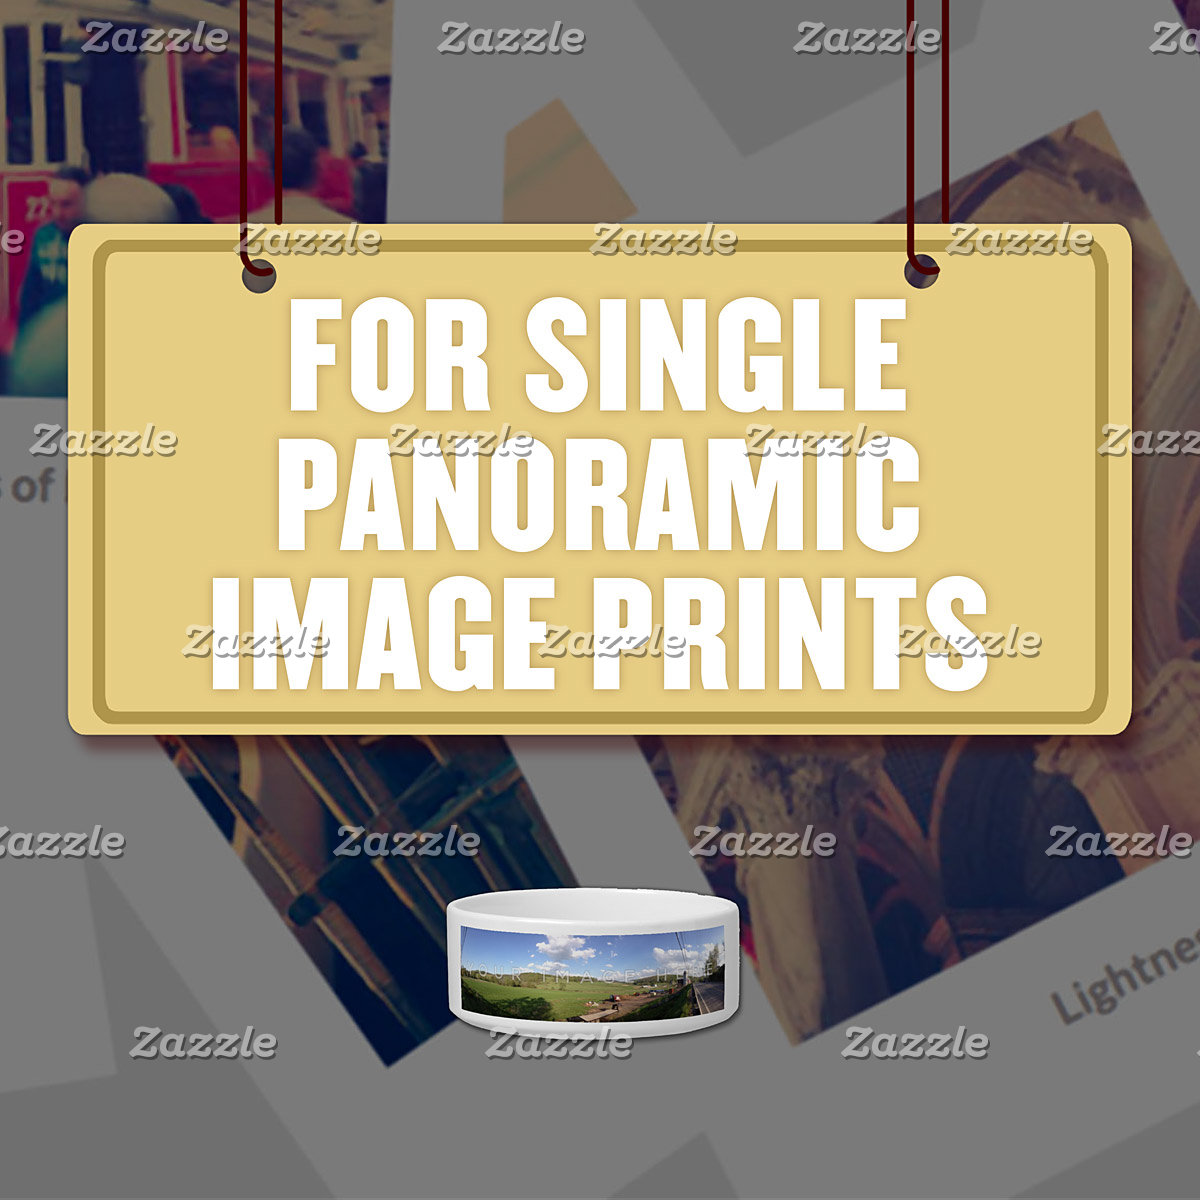 For Single (1) Panoramic Photo Prints